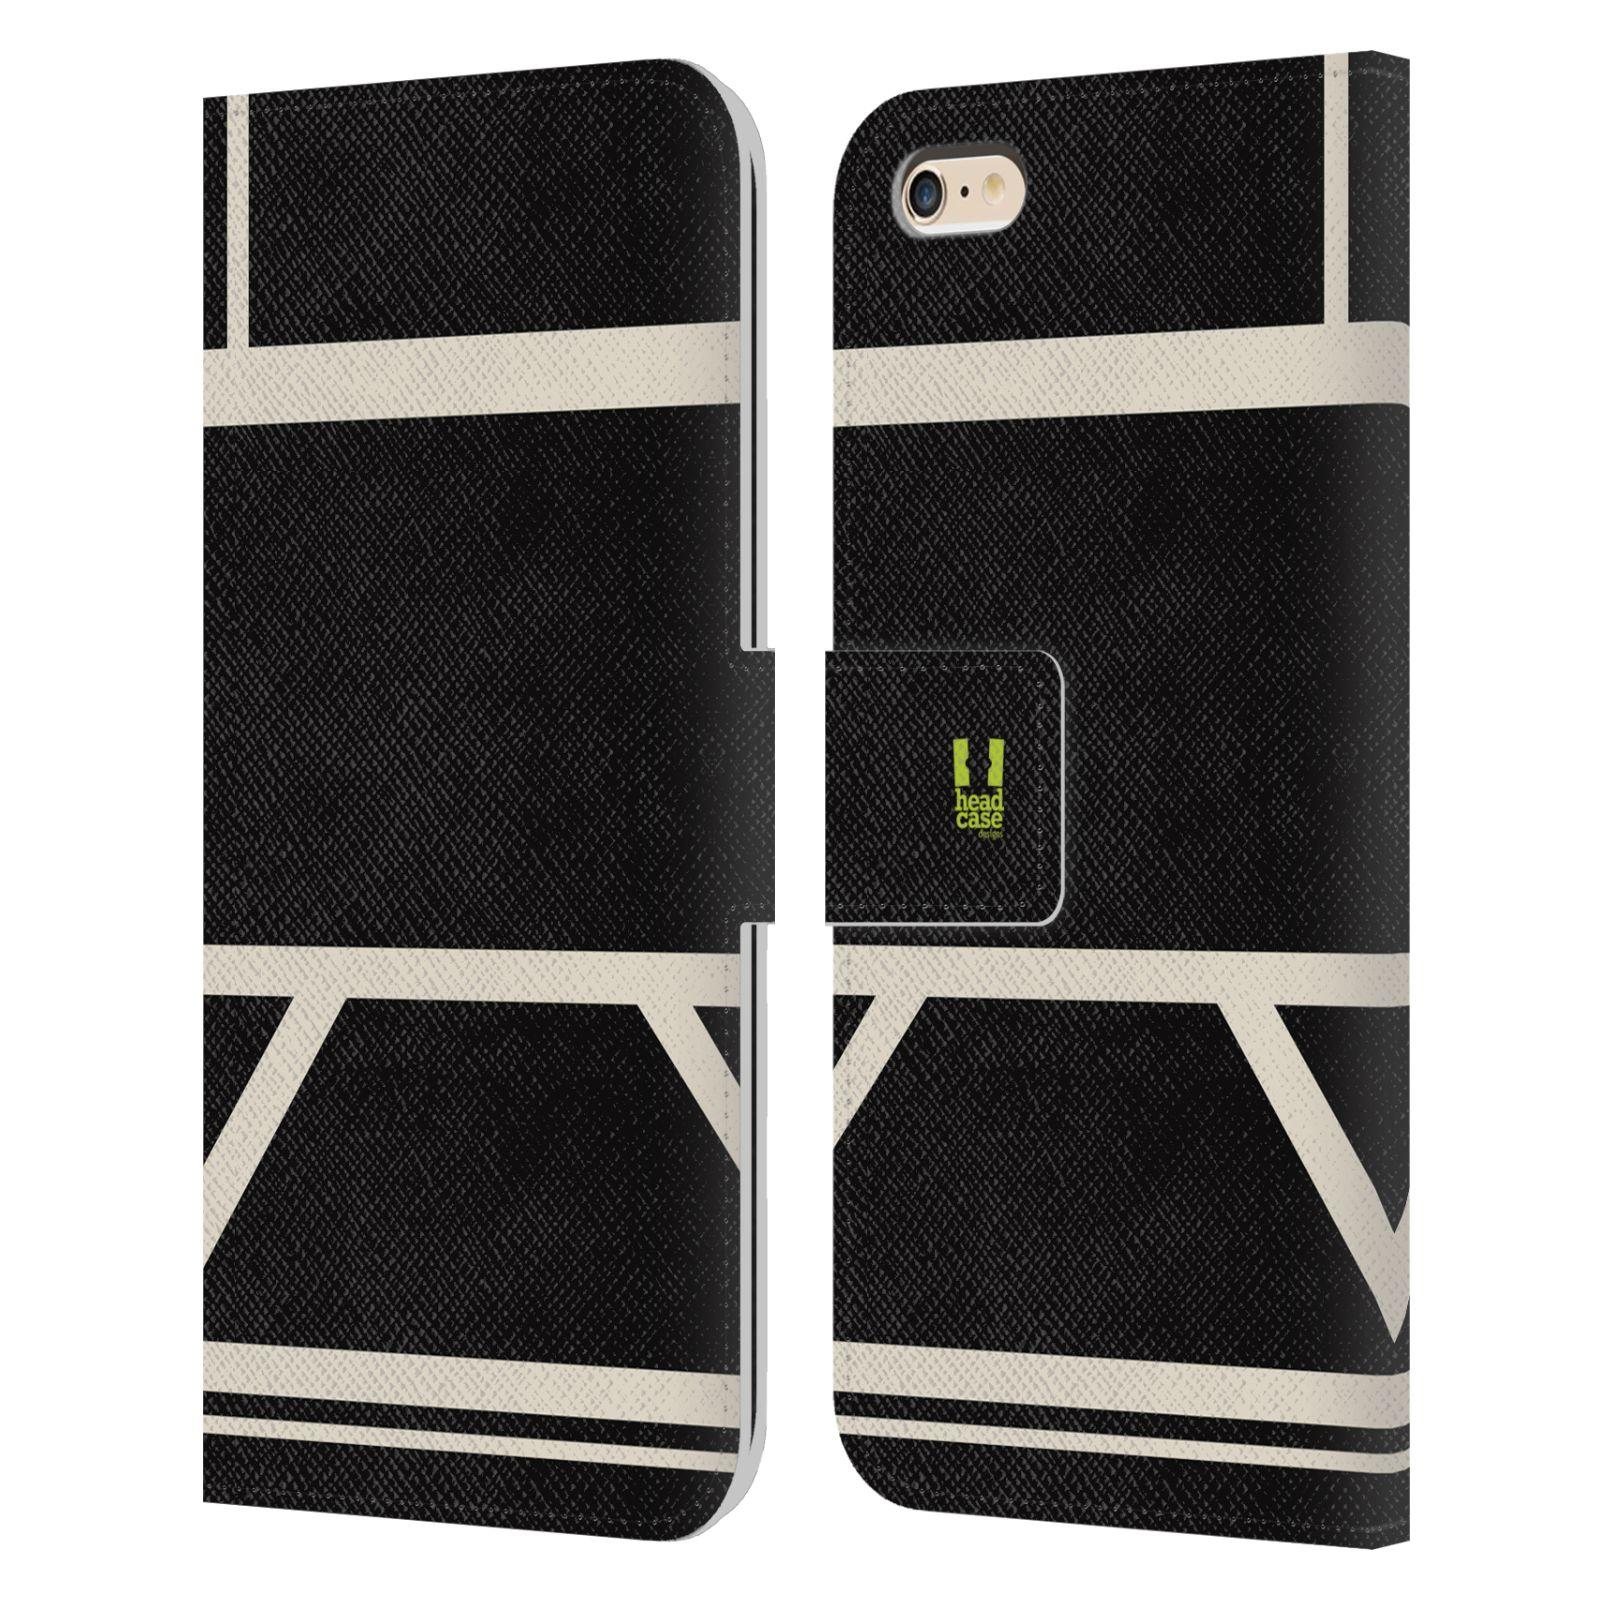 HEAD CASE Flipové pouzdro pro mobil Apple Iphone 6 PLUS/6S PLUS barevné tvary černá a bílá proužek